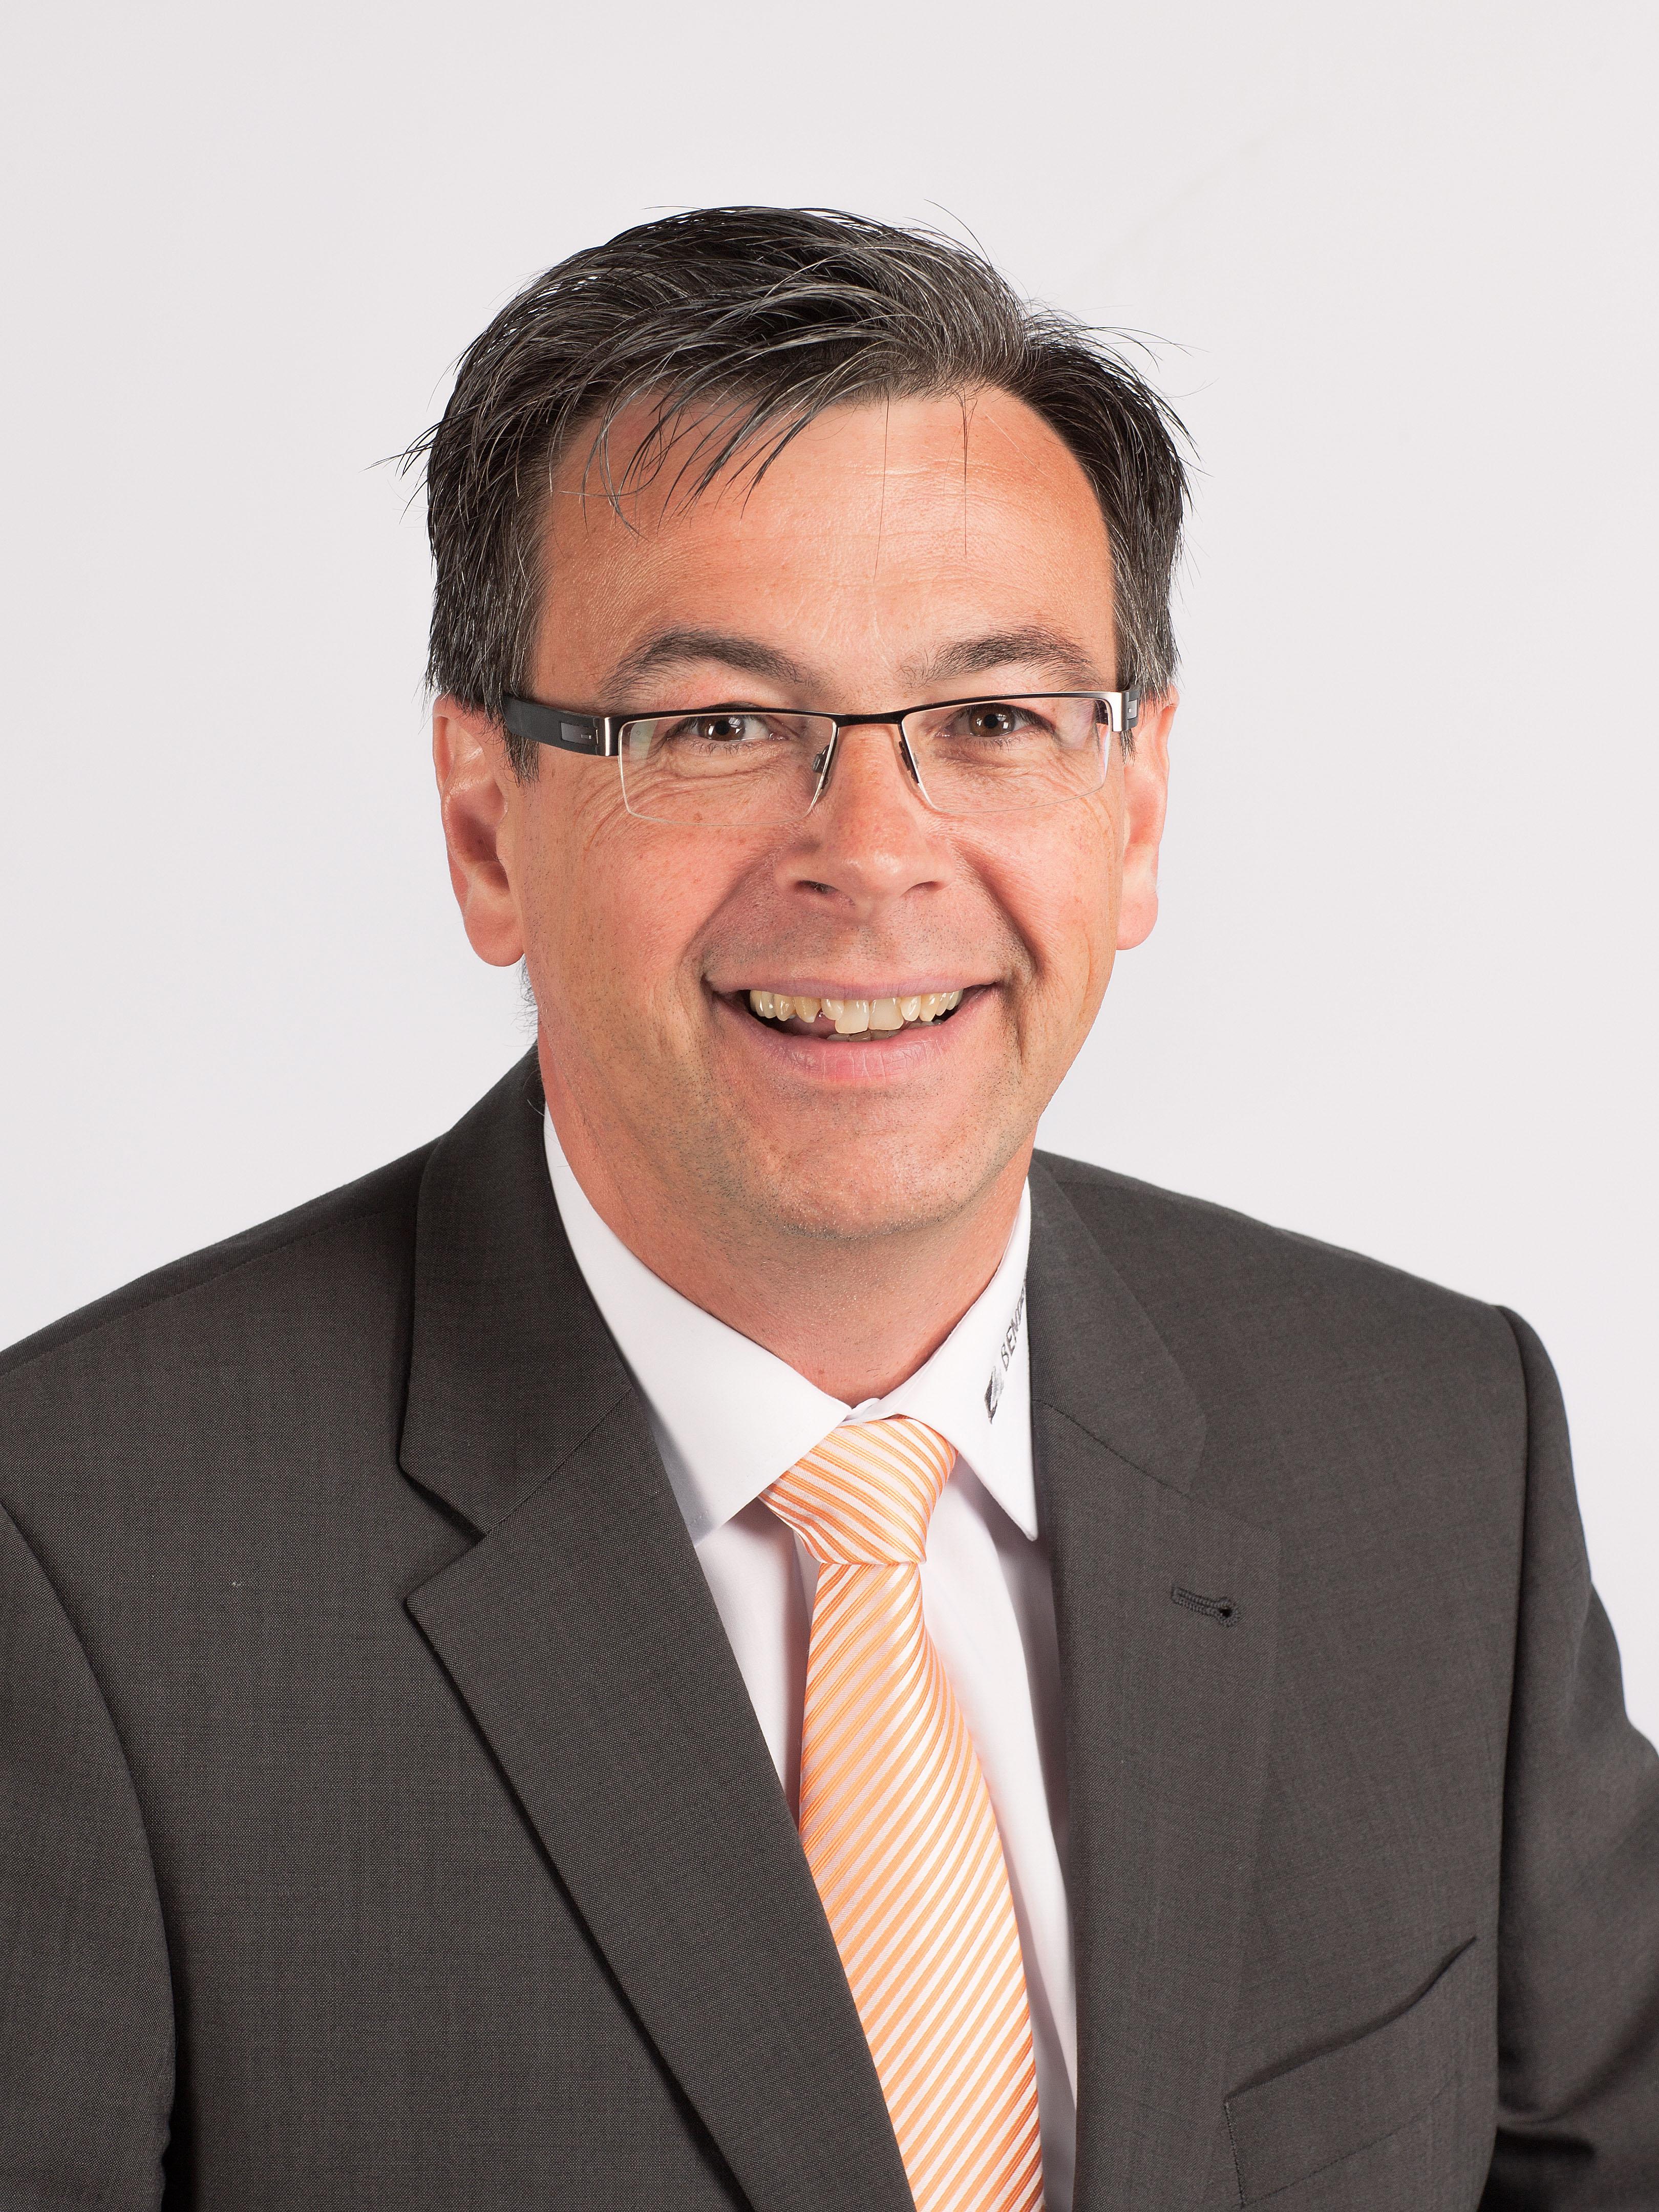 Jürgen Fischer Region Management Hospital Europe despre solutiile BENDER pentru spitale - Jürgen Fischer Region Management